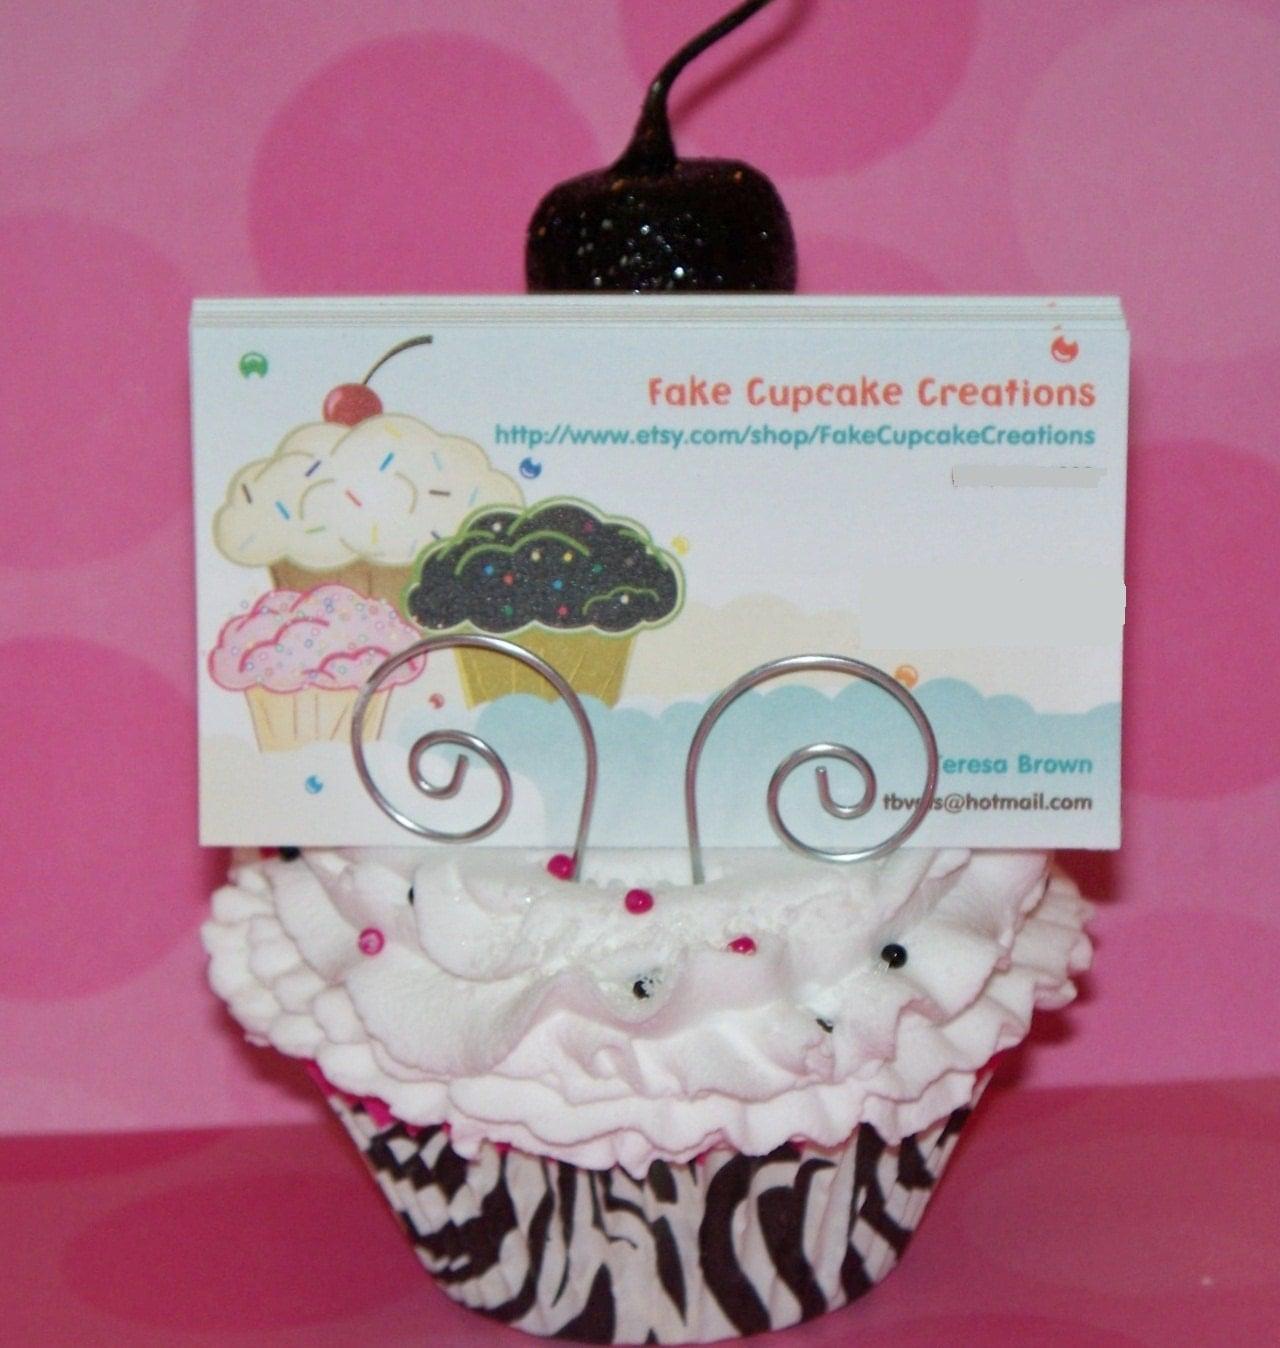 original fake cupcake business card holder by